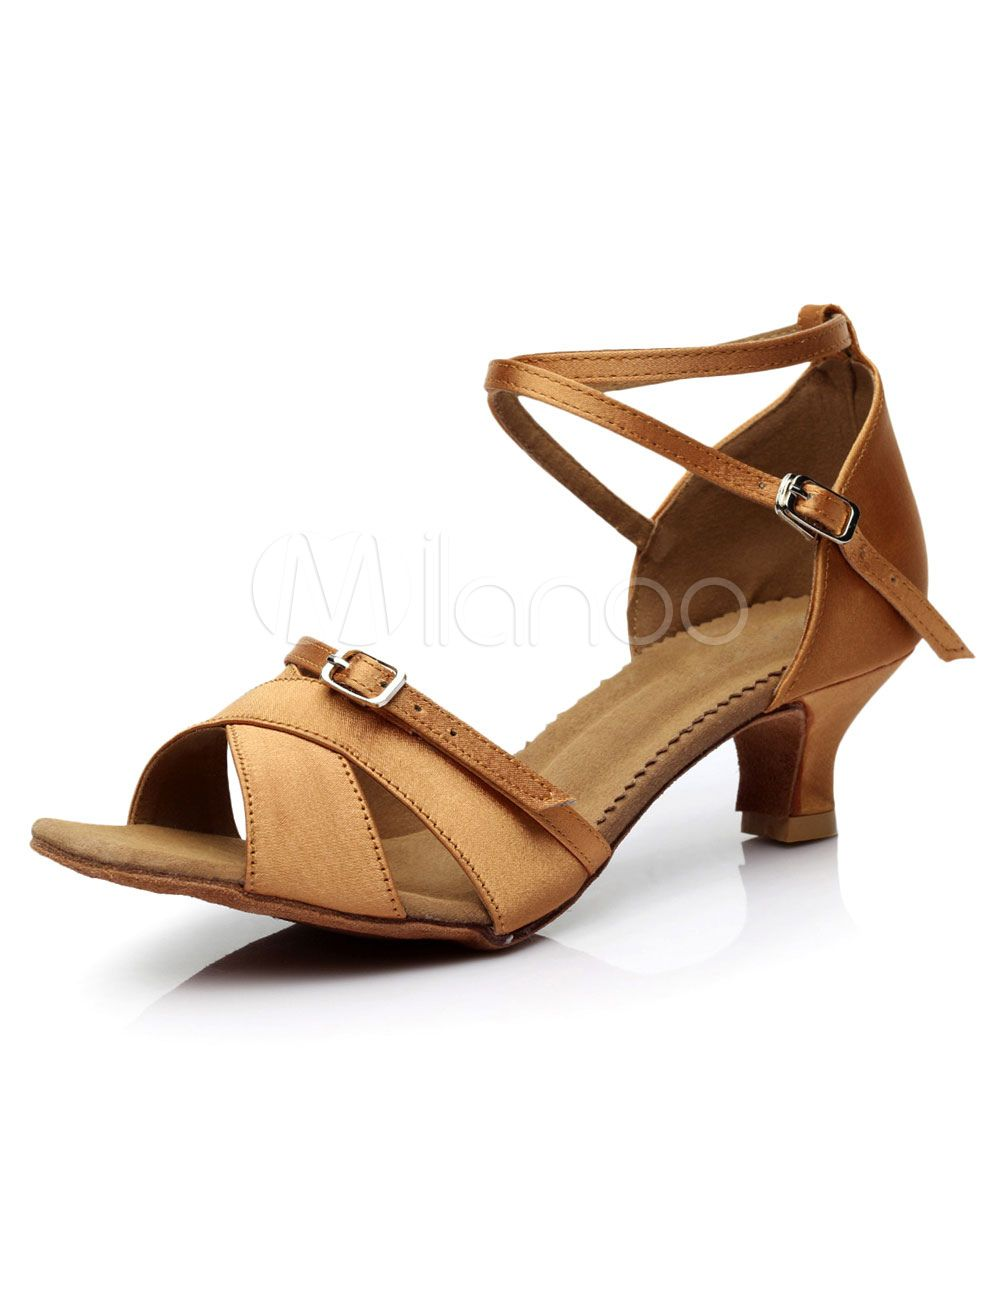 bc87e4f25872 Yellow Latin Dance Sandals Straps Satin Heels for Women